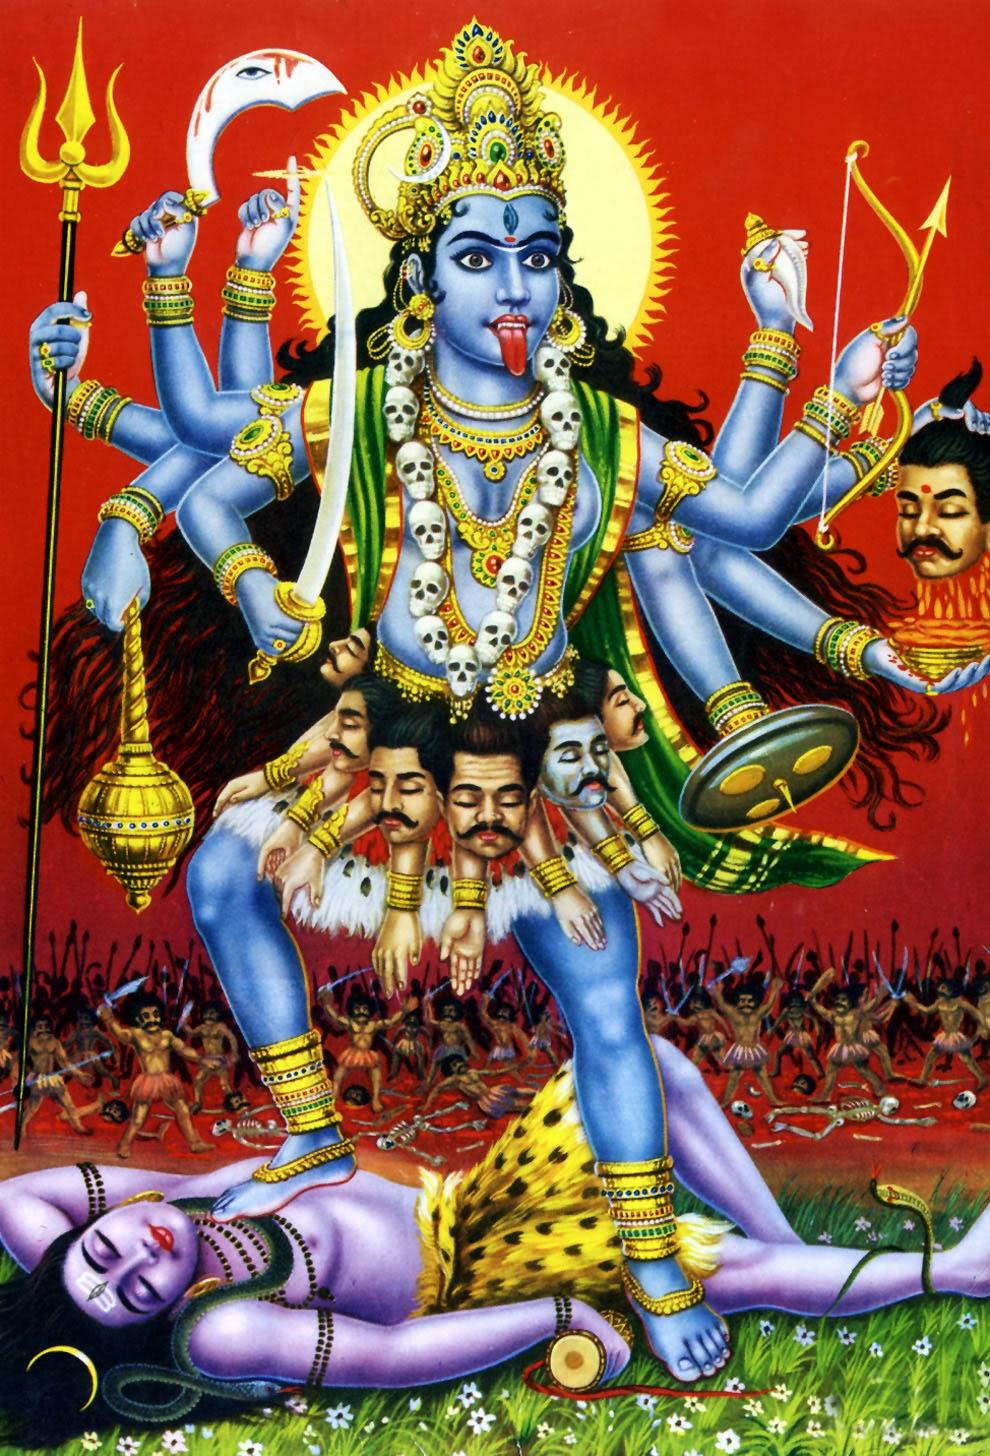 Kali devi temple in bangalore dating 1